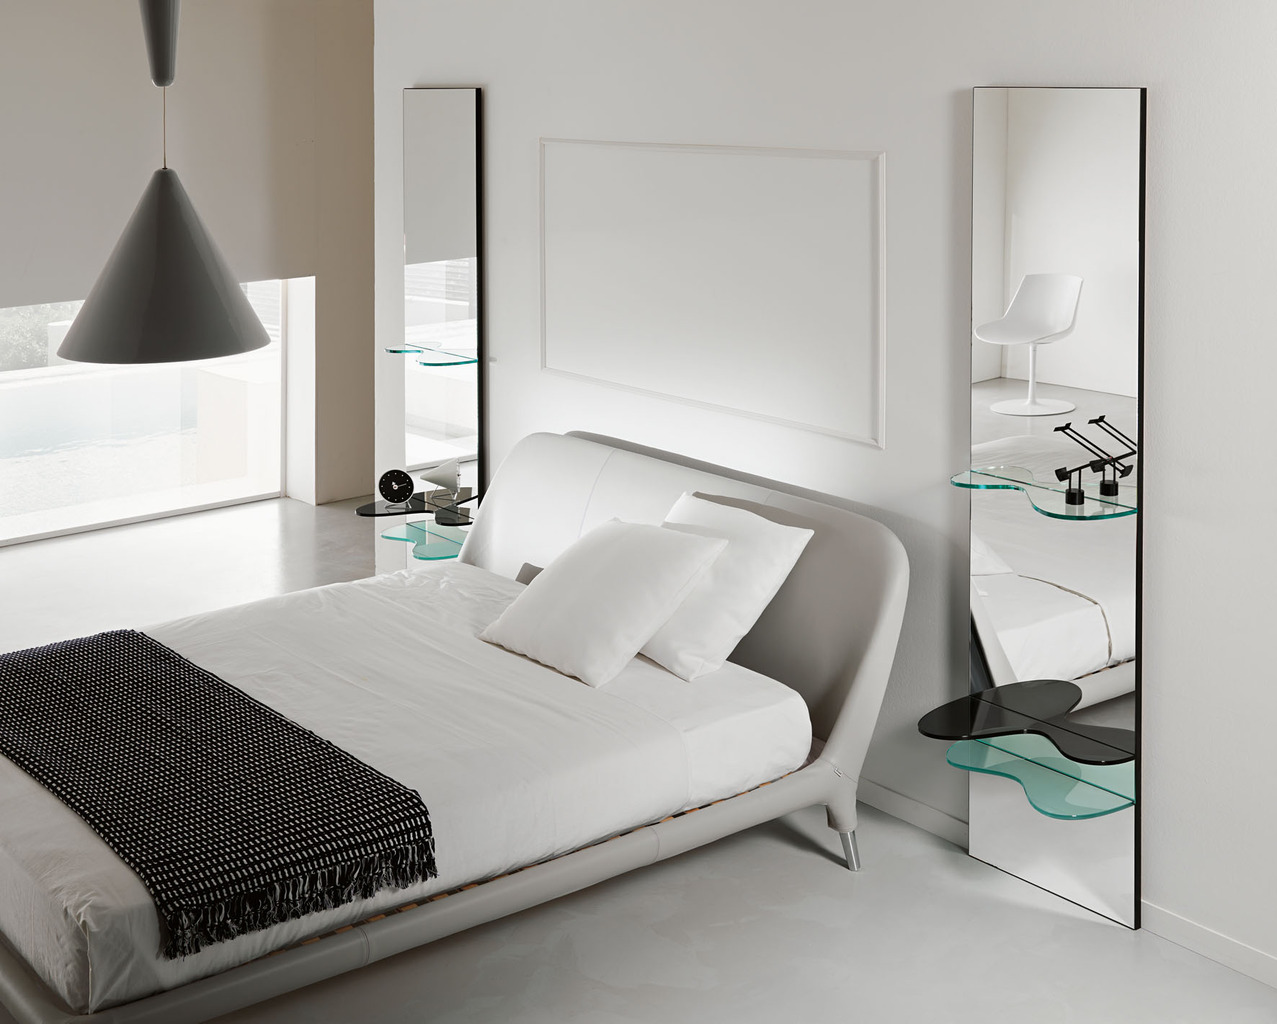 зеркала по бокам кровати в стиле минимализм